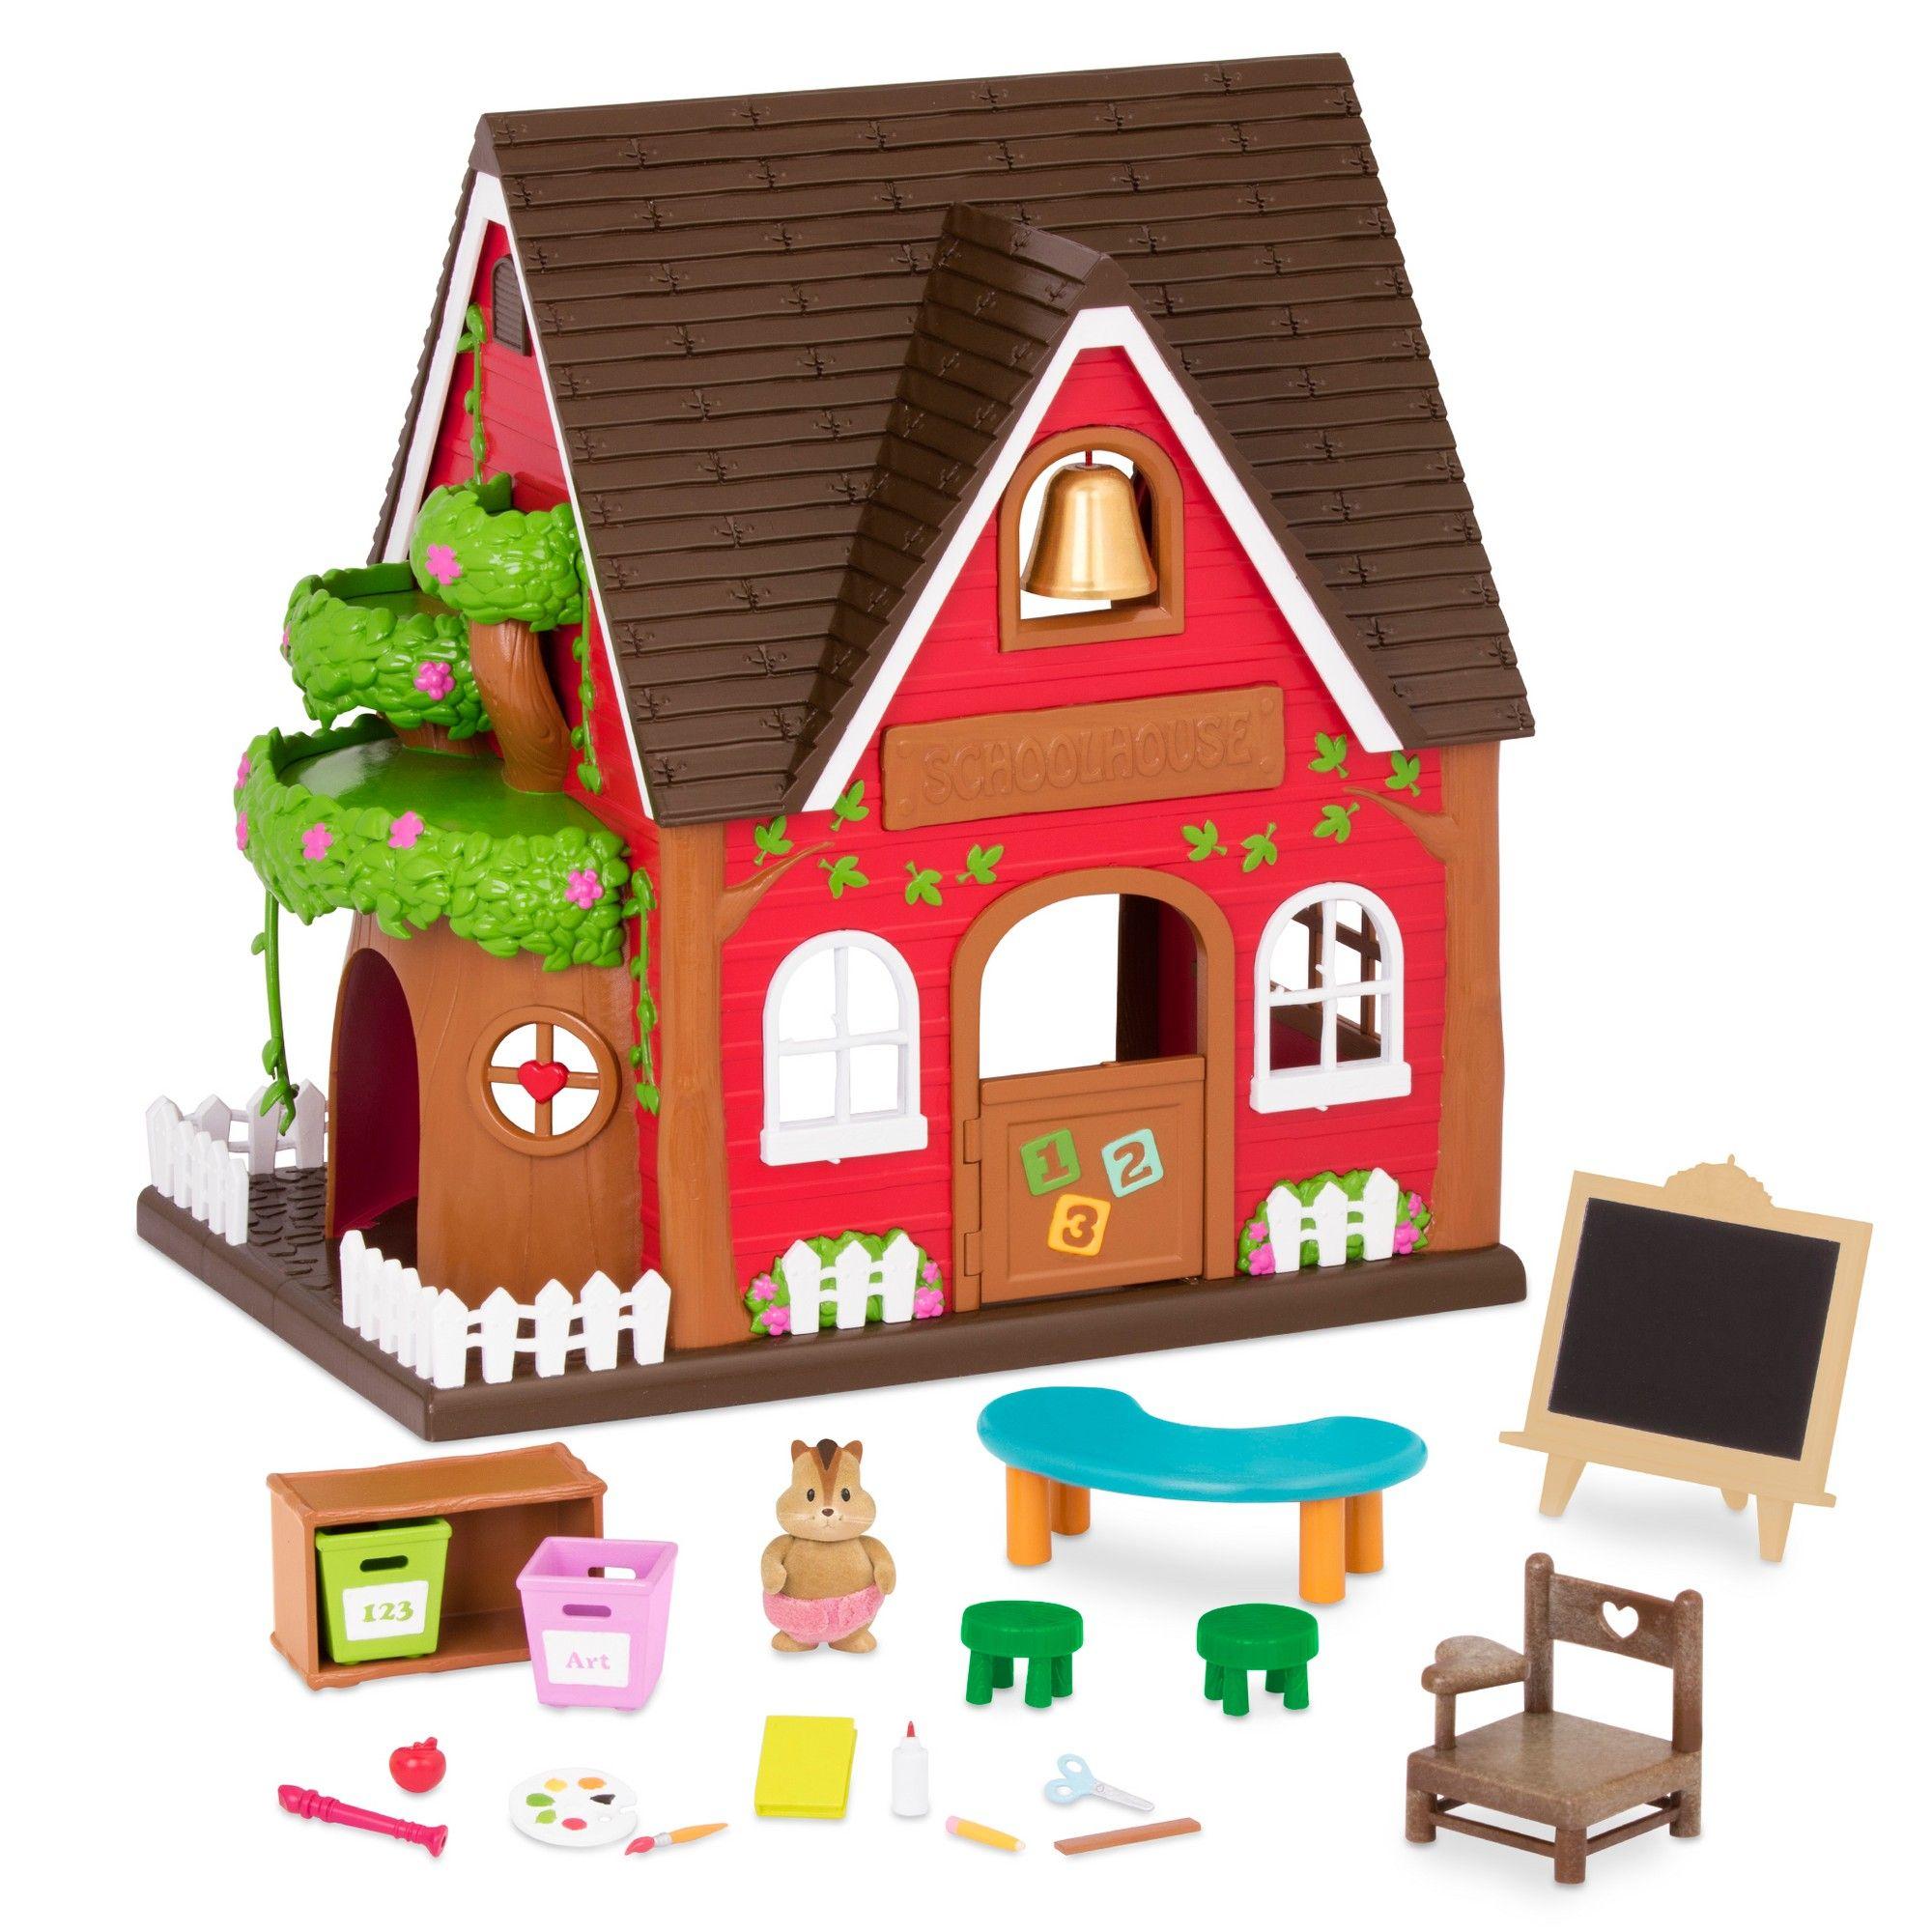 Lil woodzeez elementary school house